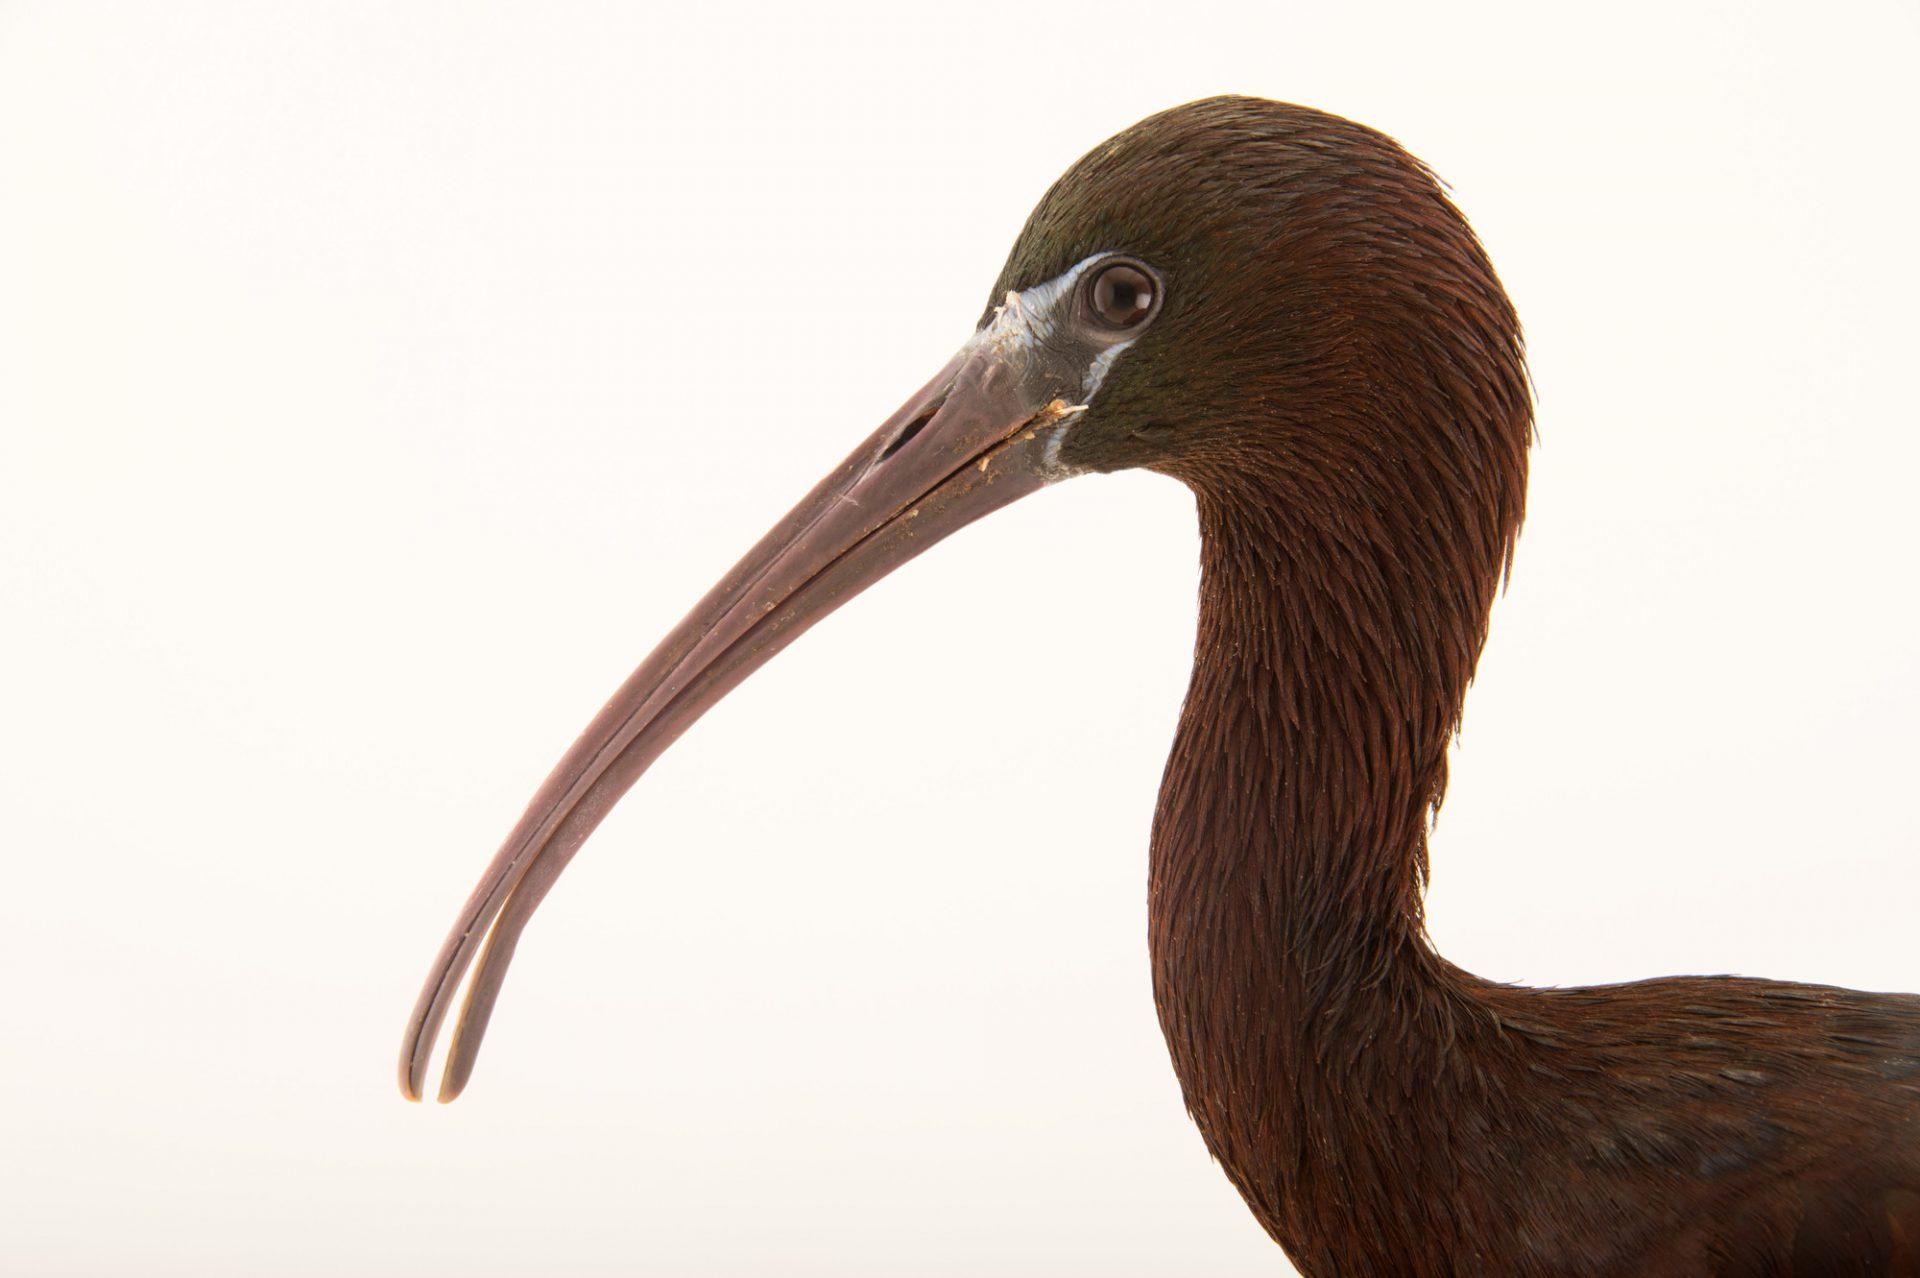 Photo: Glossy ibis (Plegadis falcinellus) from the Budapest Zoo.